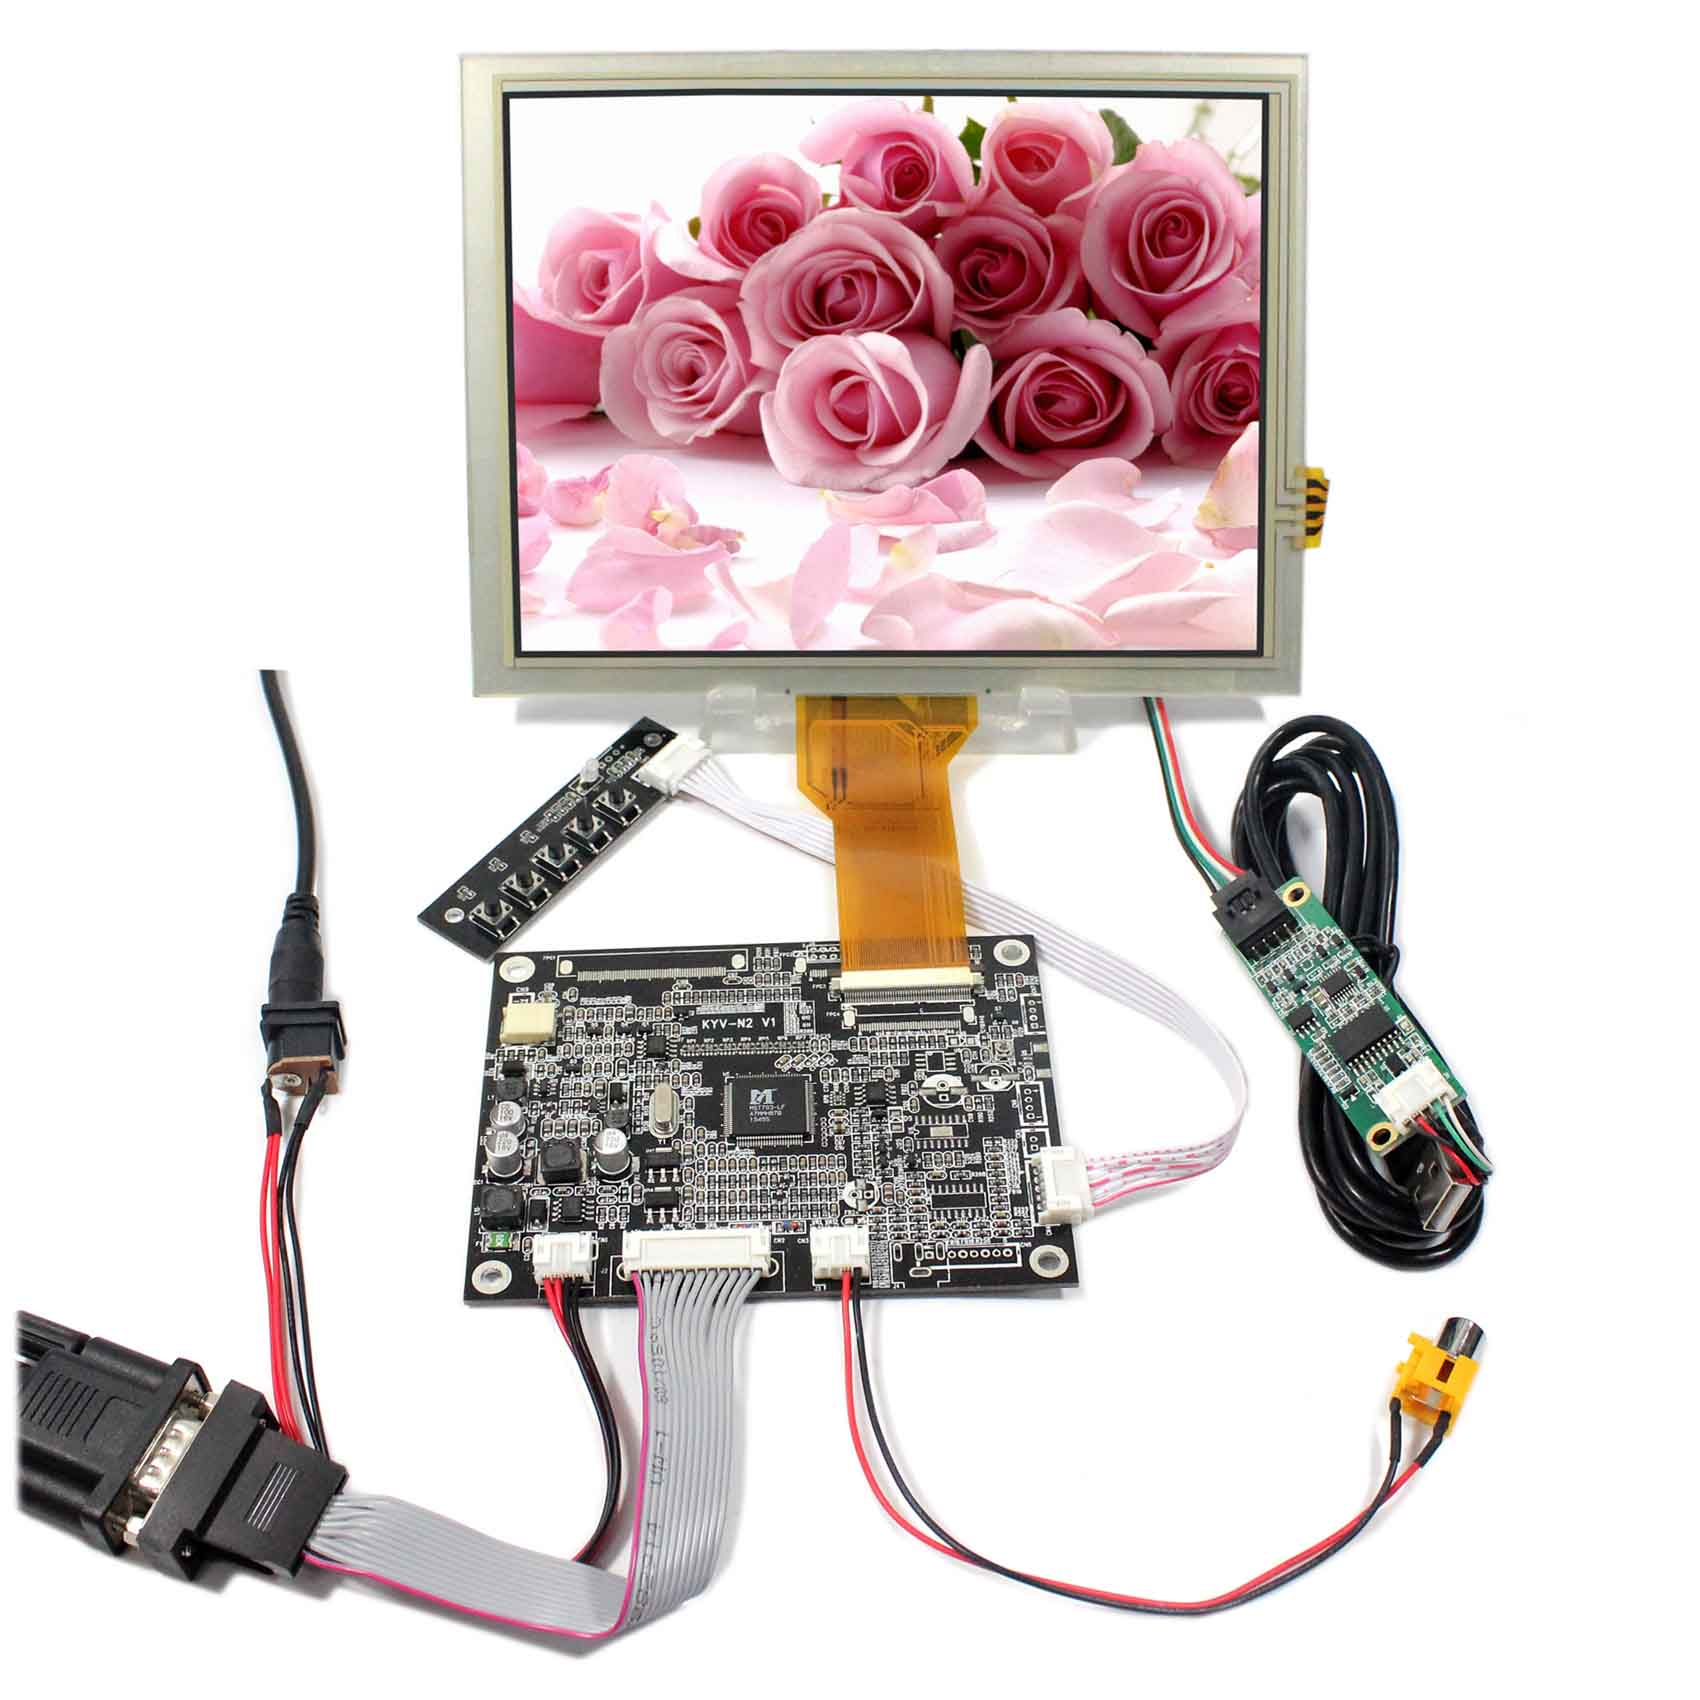 VGA AV LCD Controller Board KYV-N2 V1+8inch 800x600 EJ080NA-05B LCD With Touch Panel hdmi vga av audio usb lcd controller board 8inch 800x600 ej080na 05a touch lcd screen